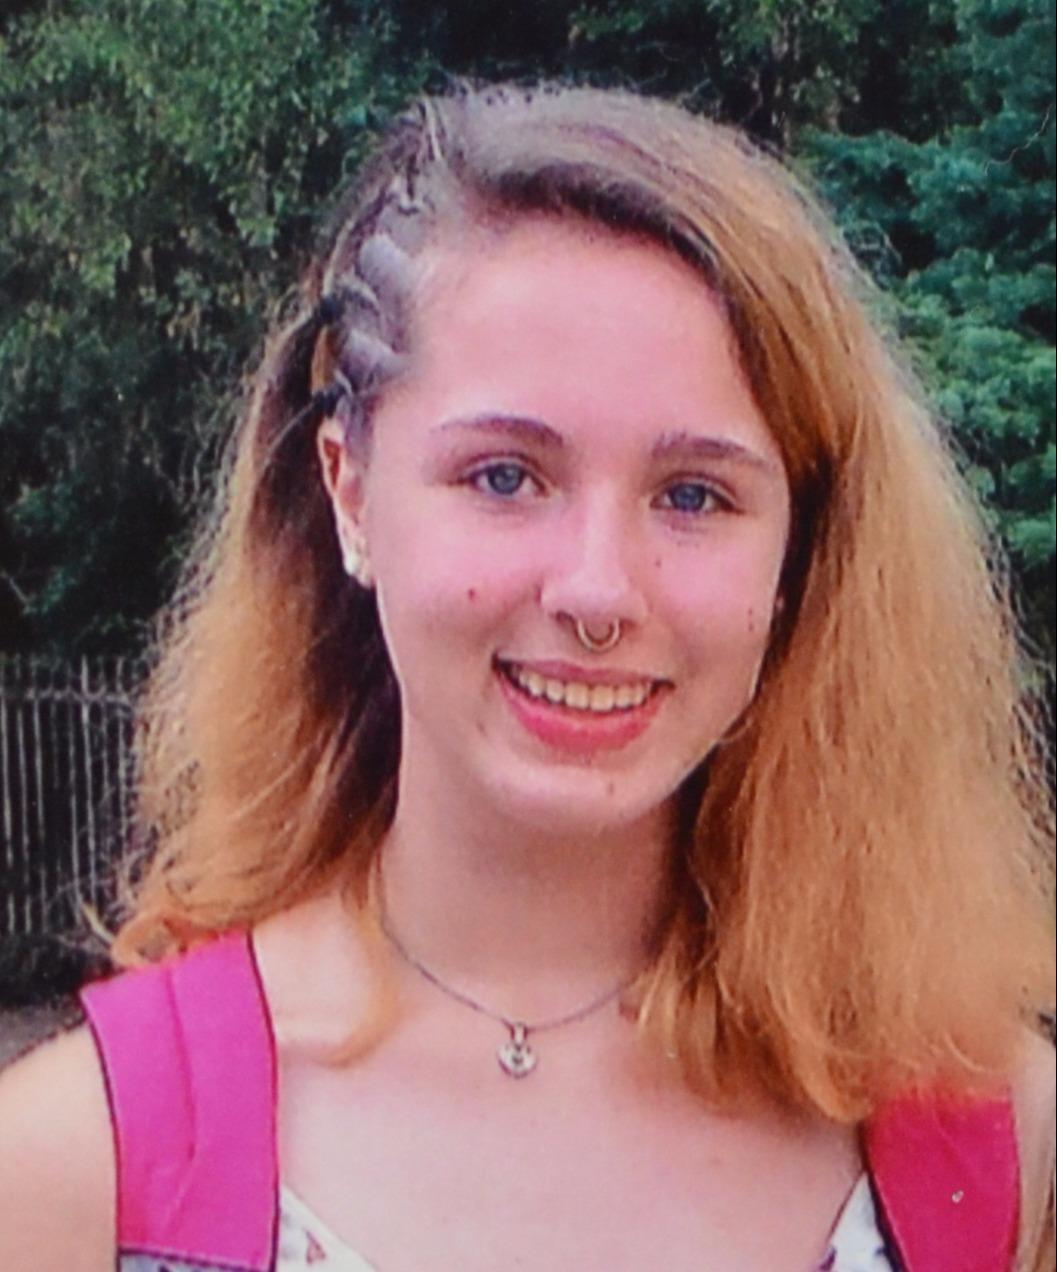 16-Jährige aus Ilsenburg vermisst